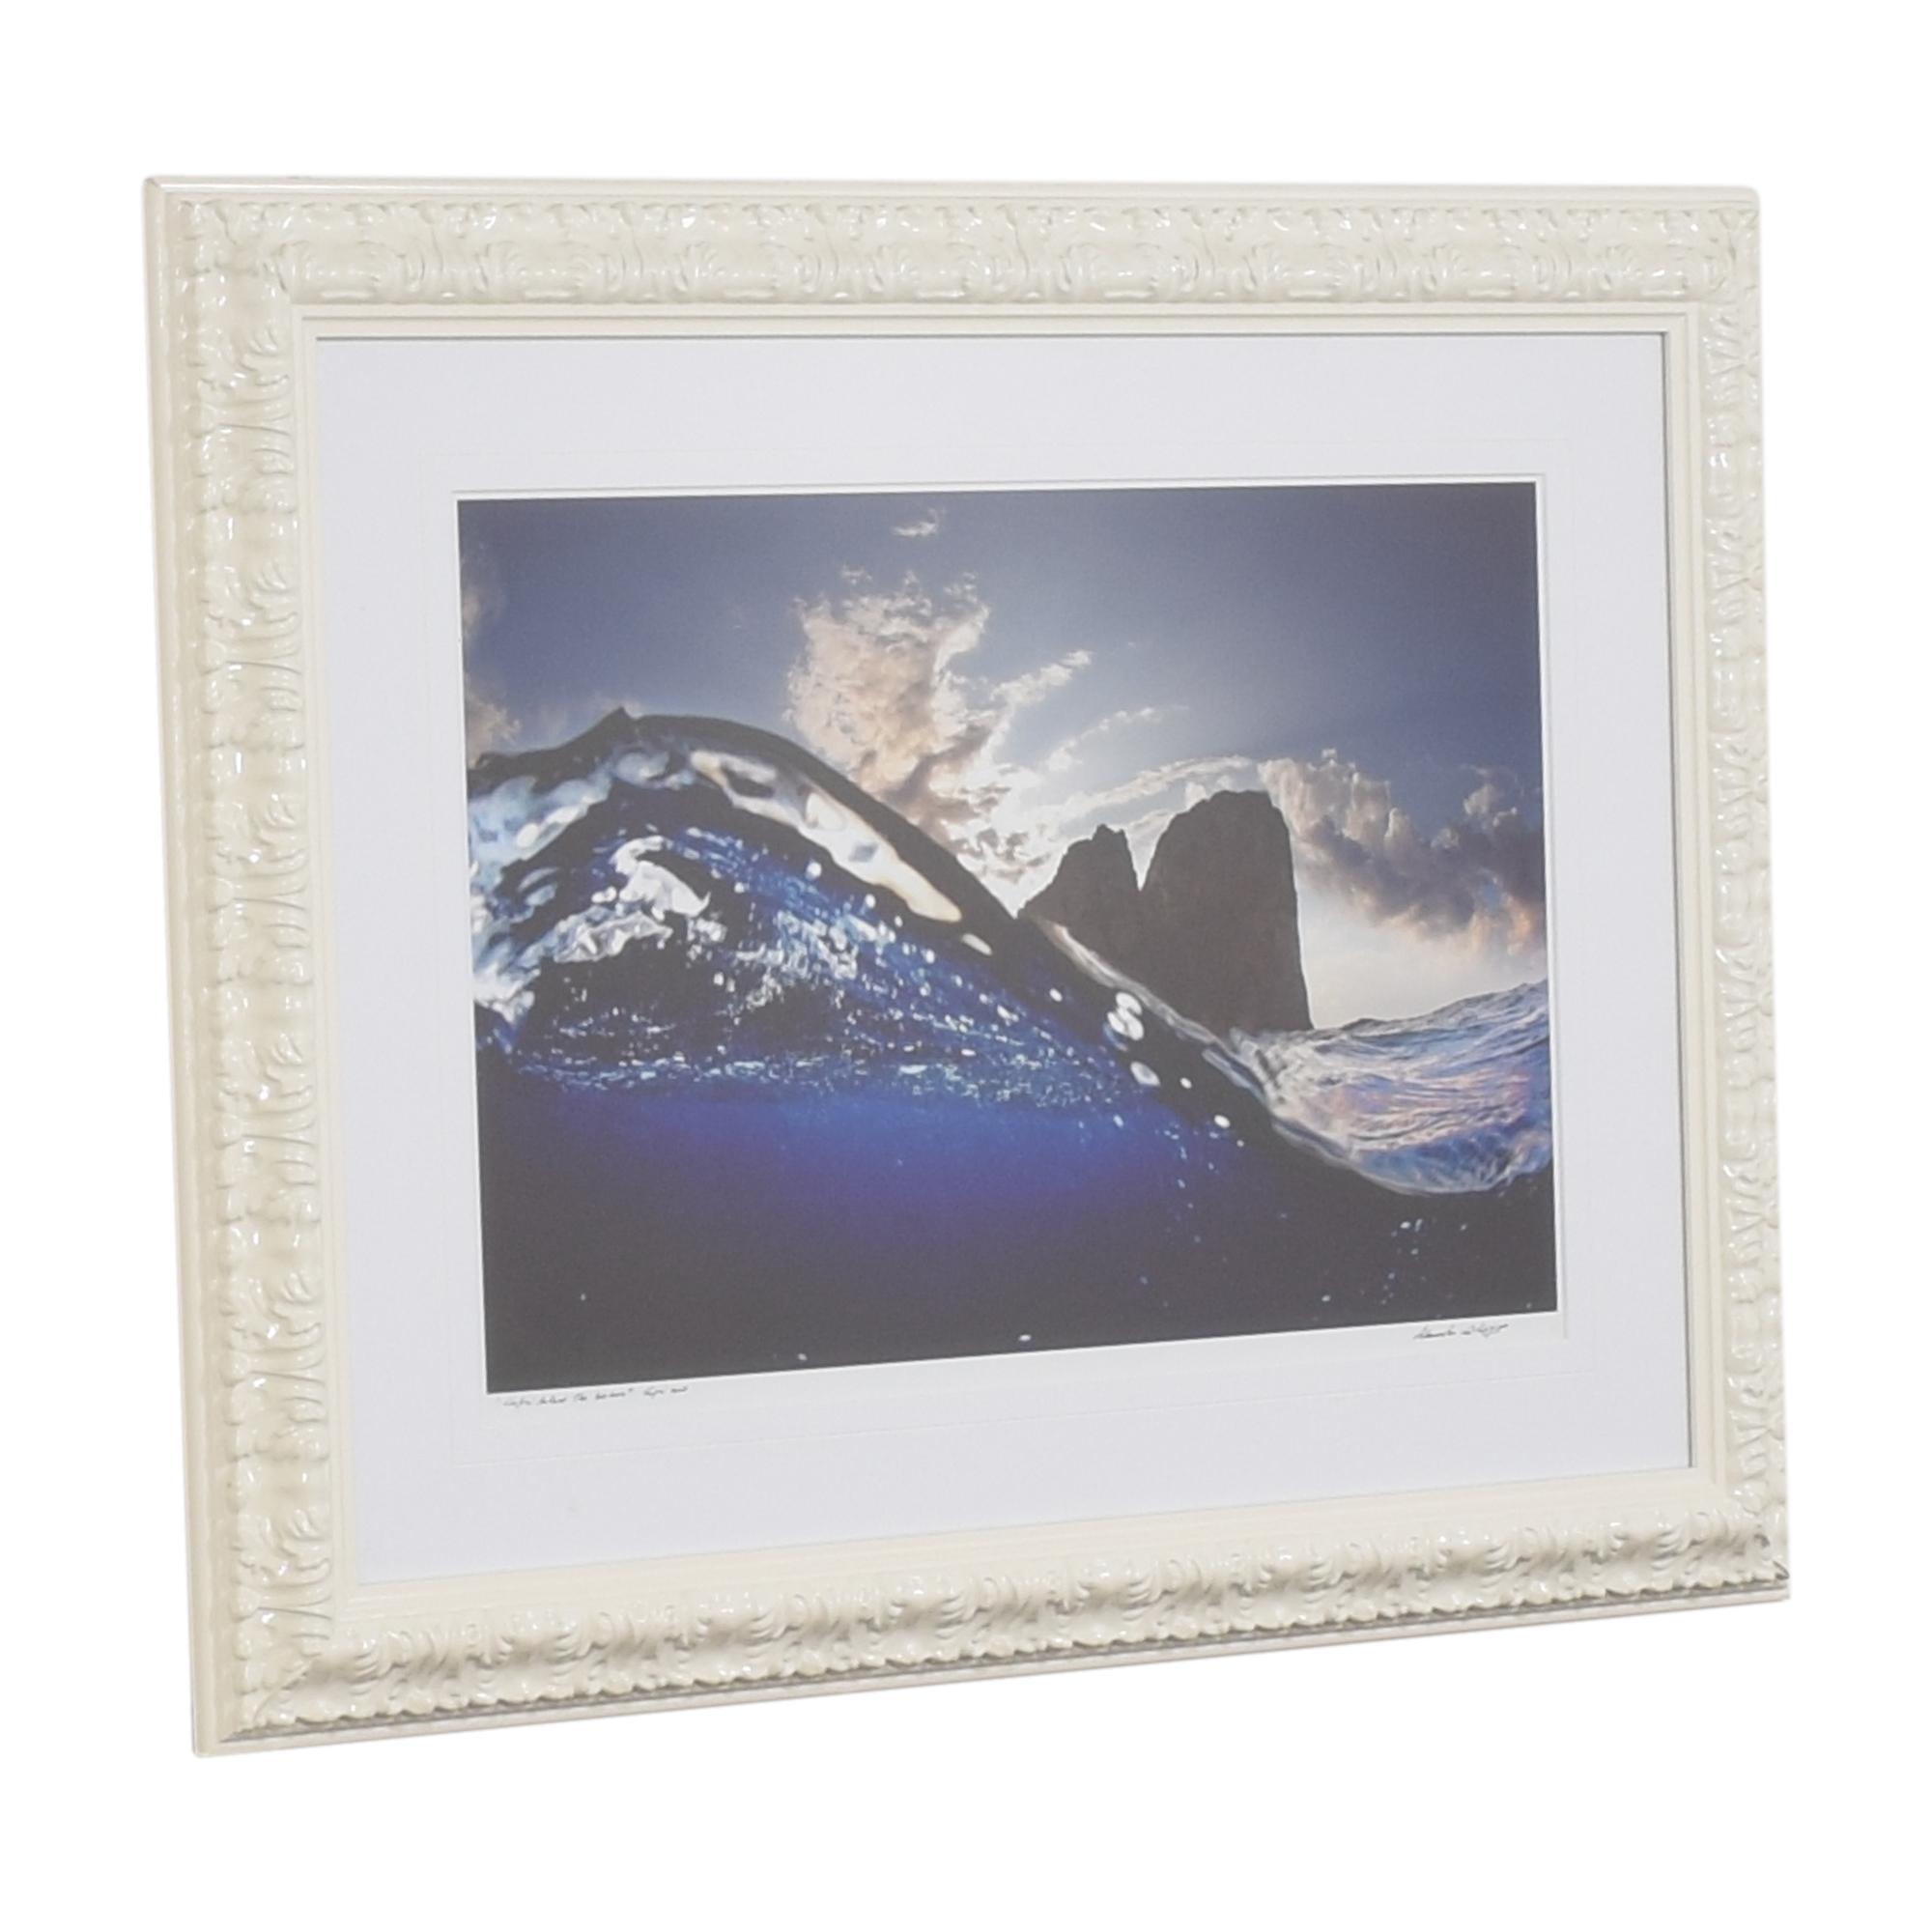 Atlantide Fine Art Gallery Alessandro Catuogno Framed Wall Art used